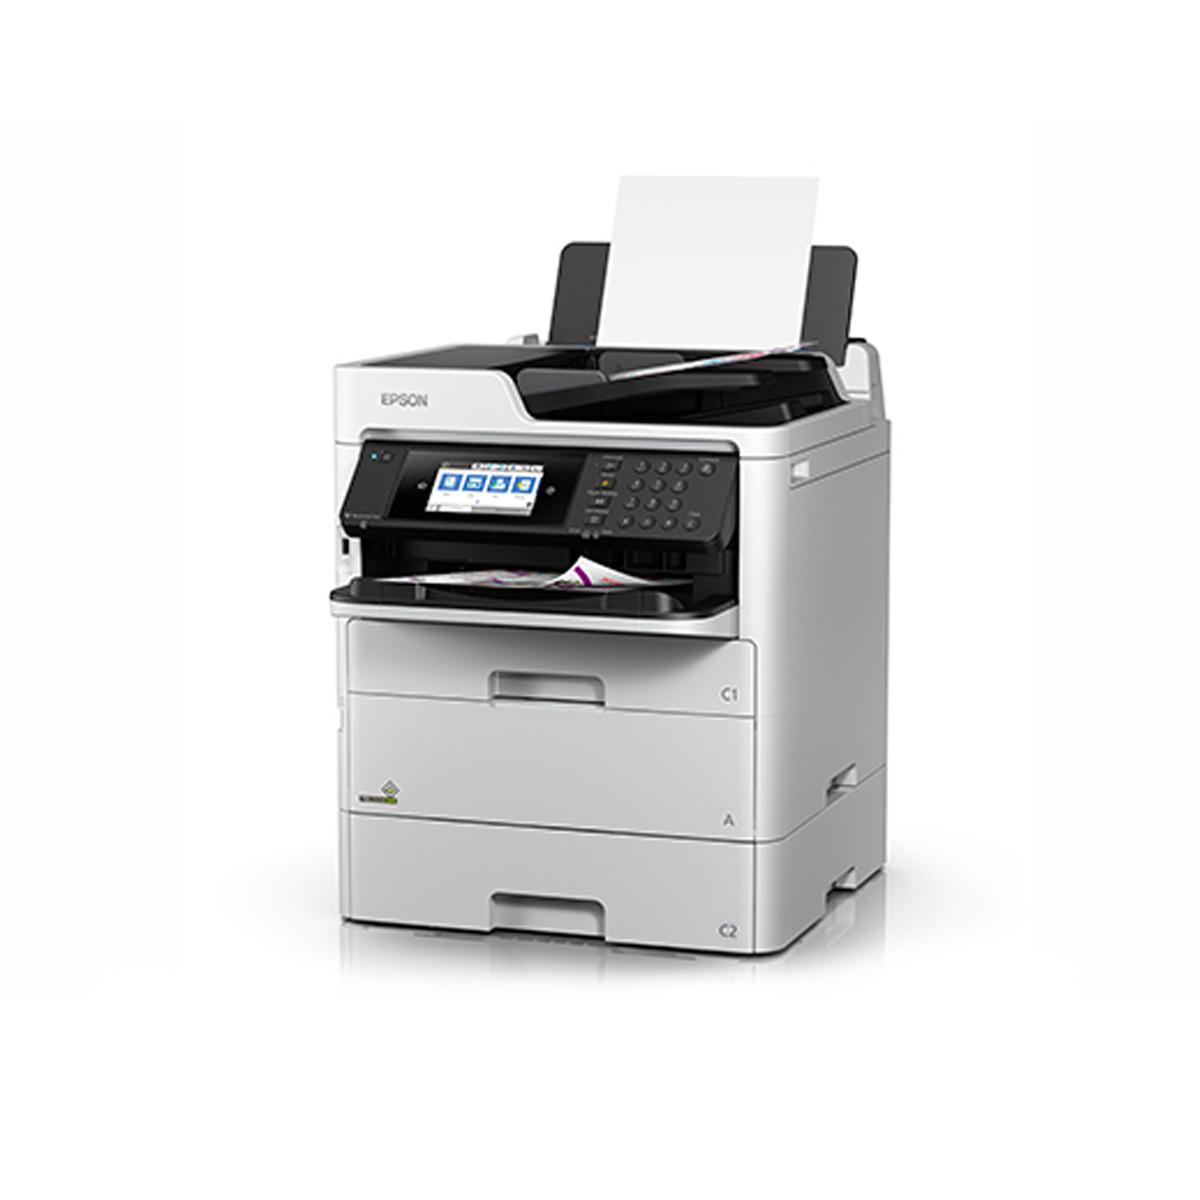 Impressora Epson WorkForce Pro WF-C579R | Multifuncional com Bolsa de Tinta Colorida Wireless